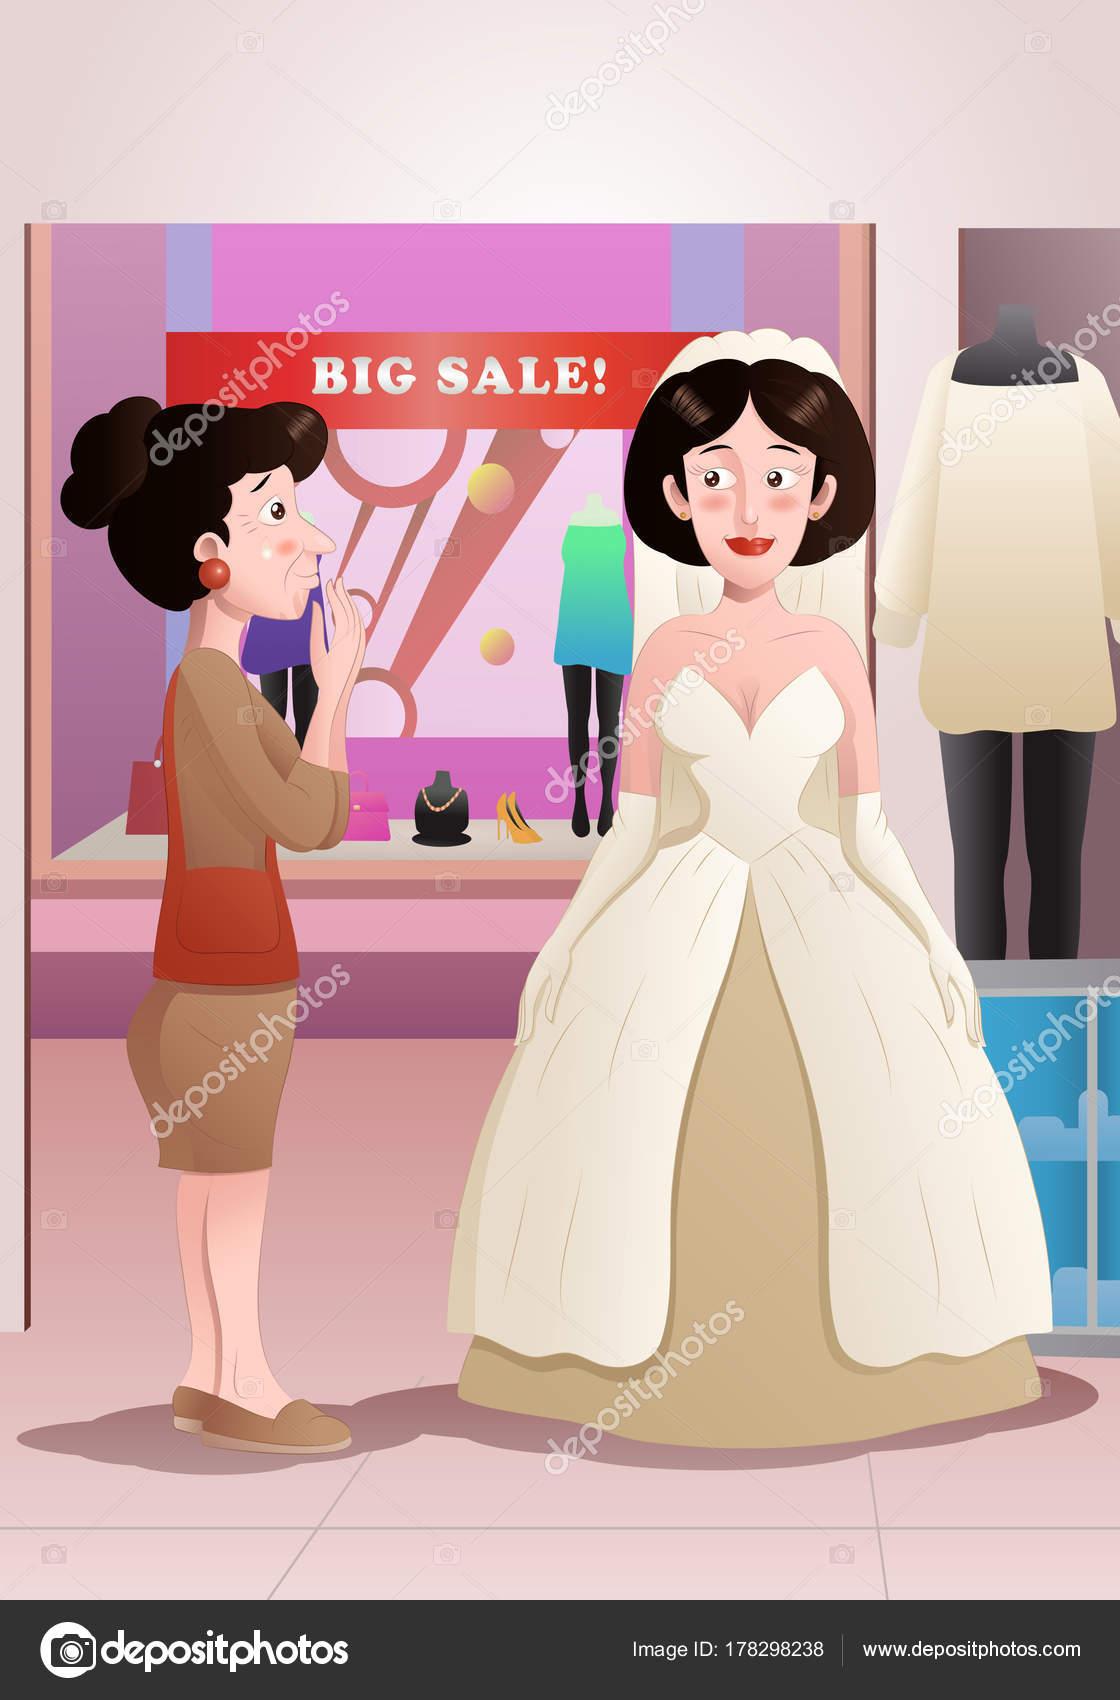 mujer prueba el vestido de novia — Foto de stock © onionime #178298238